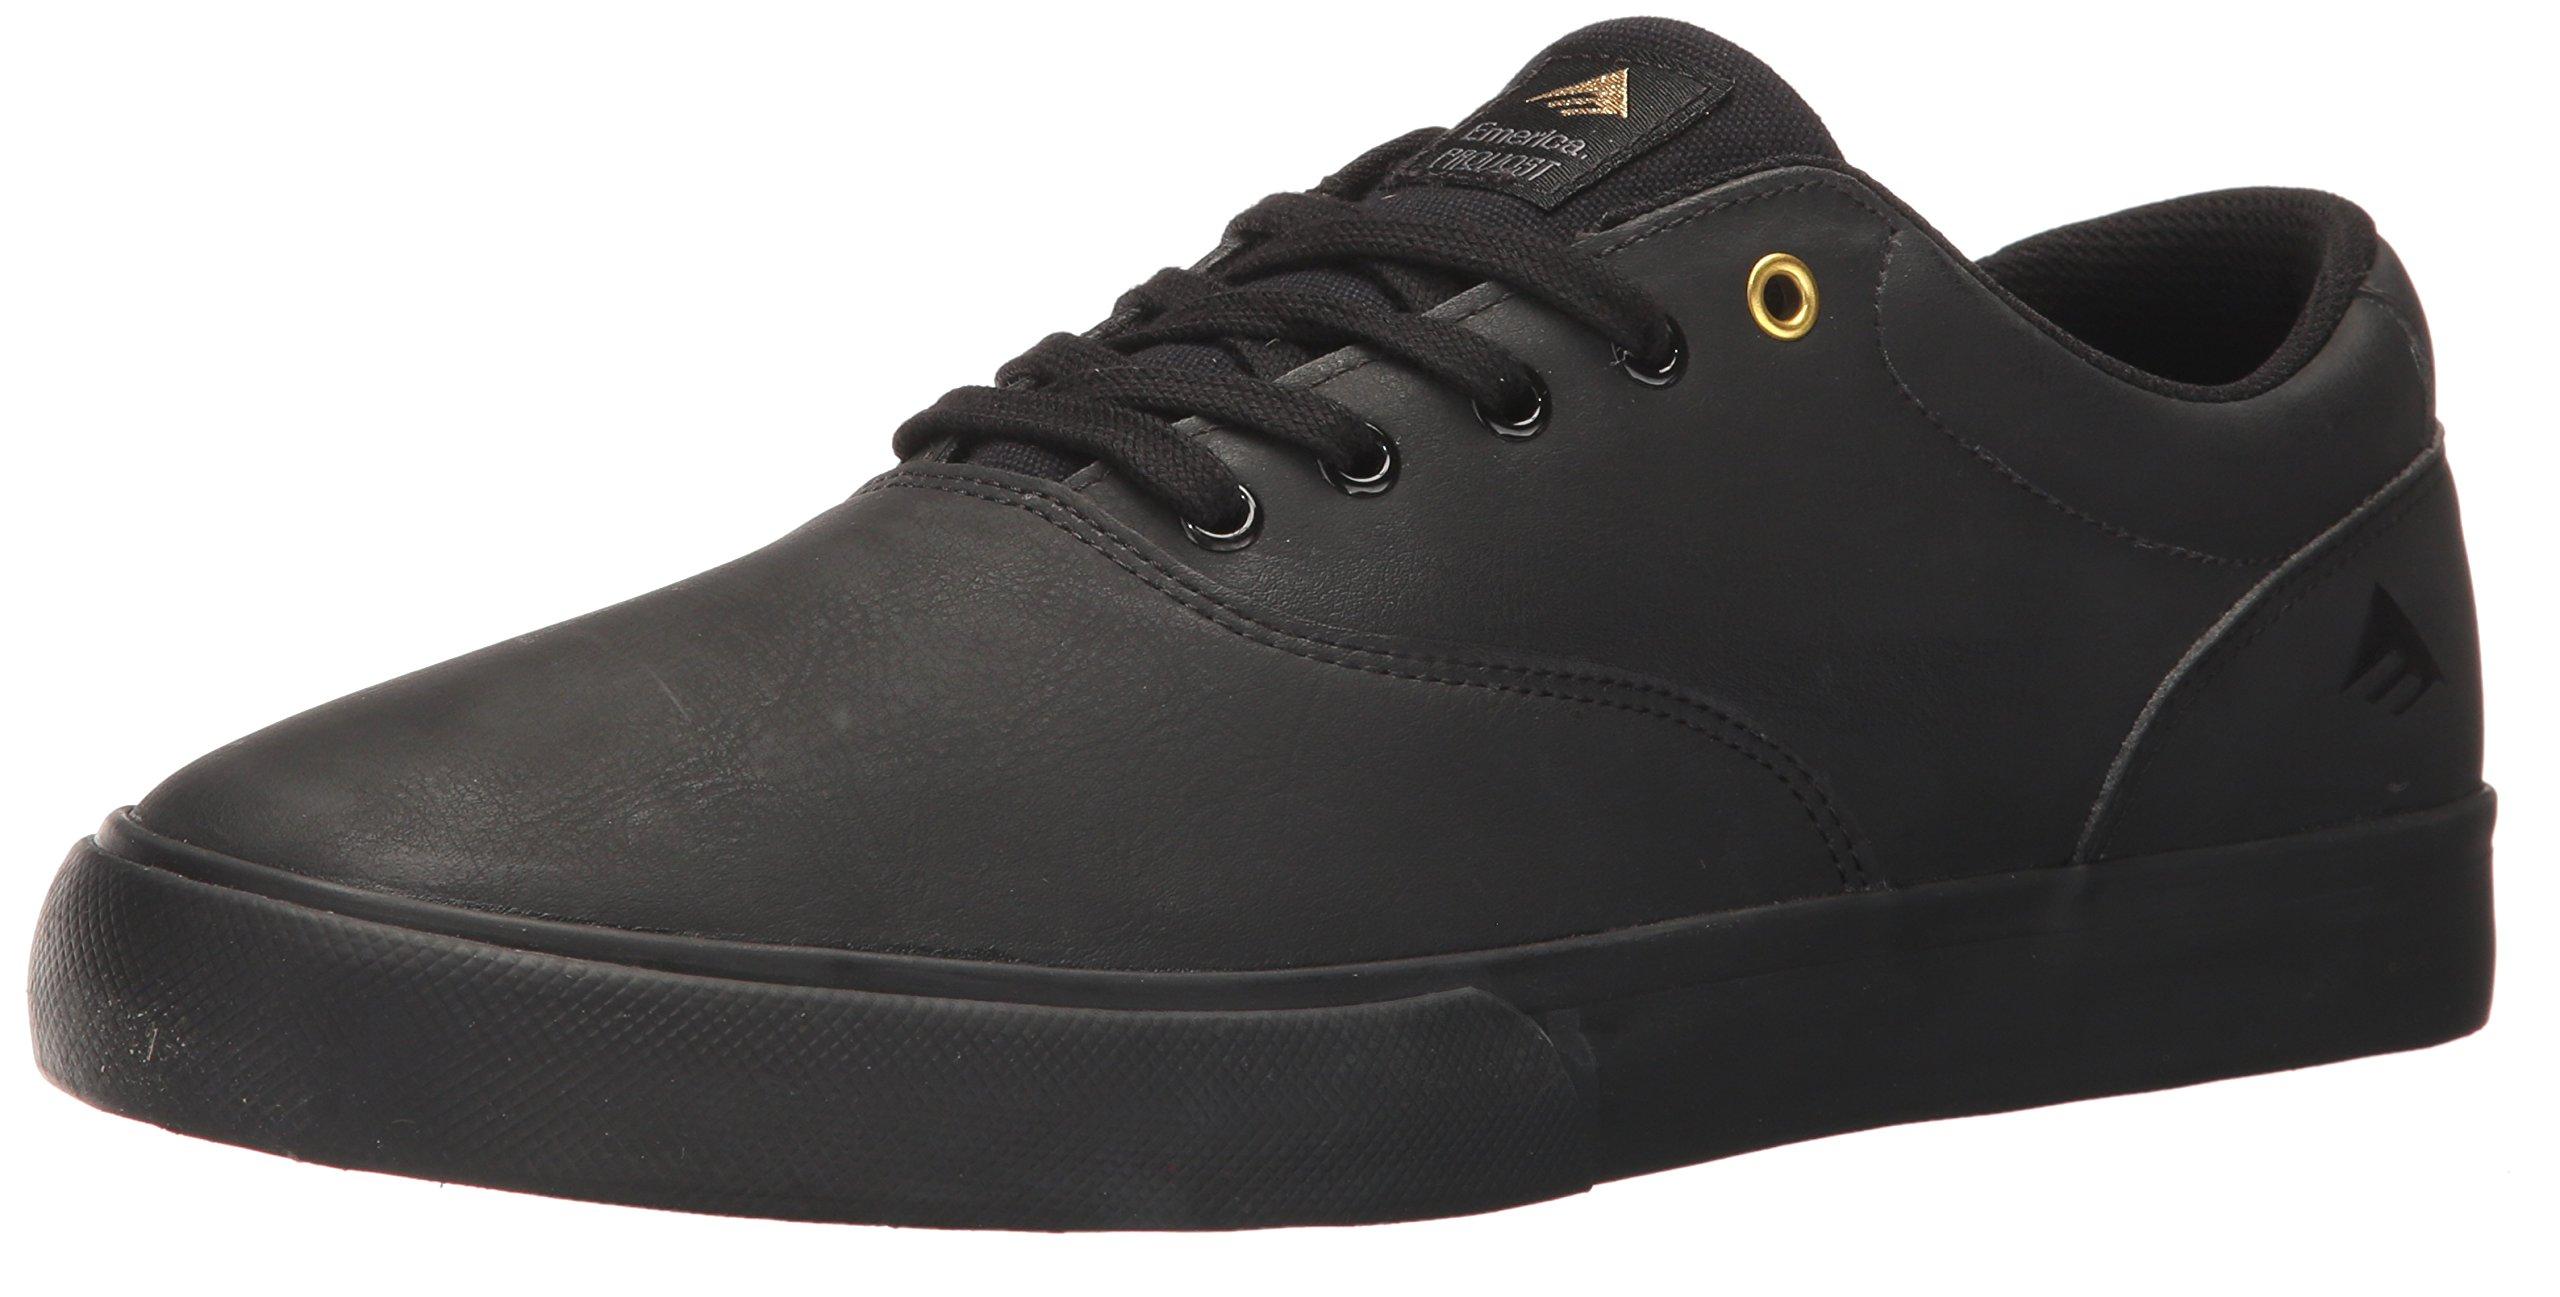 Emerica Provost Slim Vulc Skate Shoe,Black/Gold,13